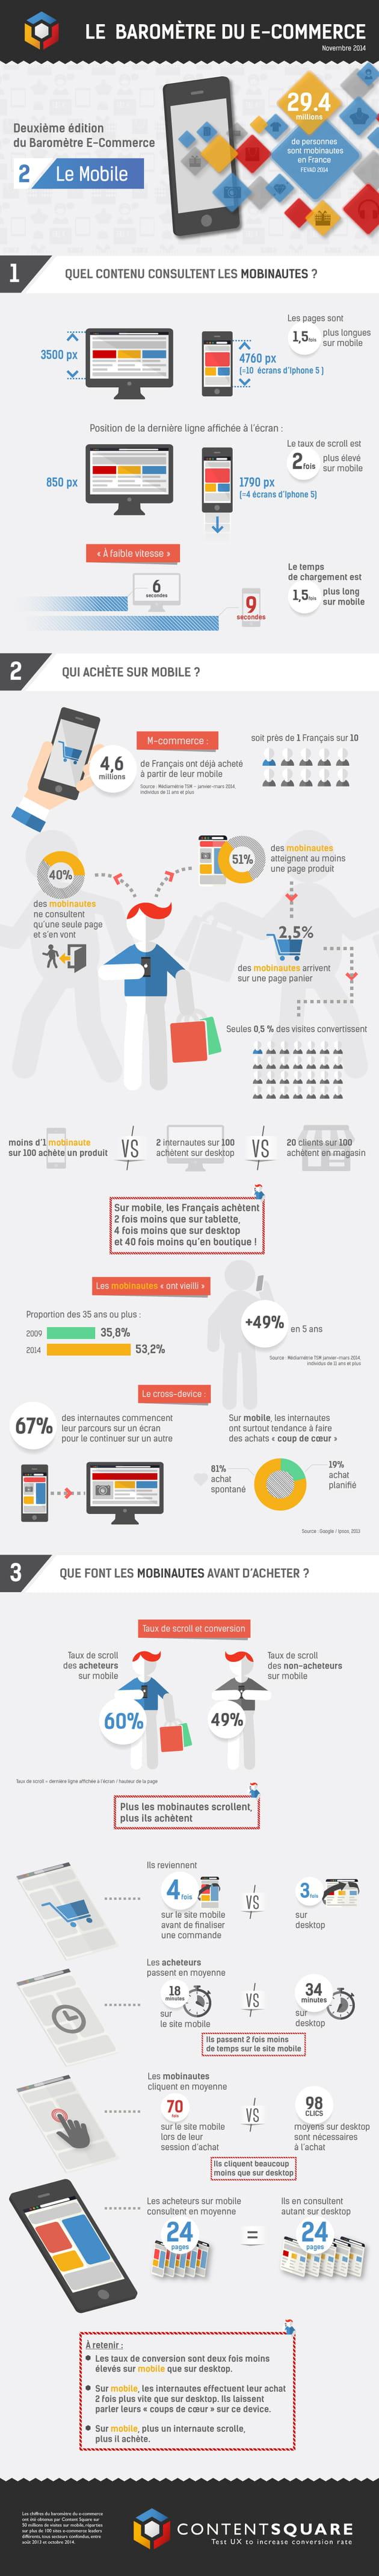 infographie ecommerce mobile nov 14